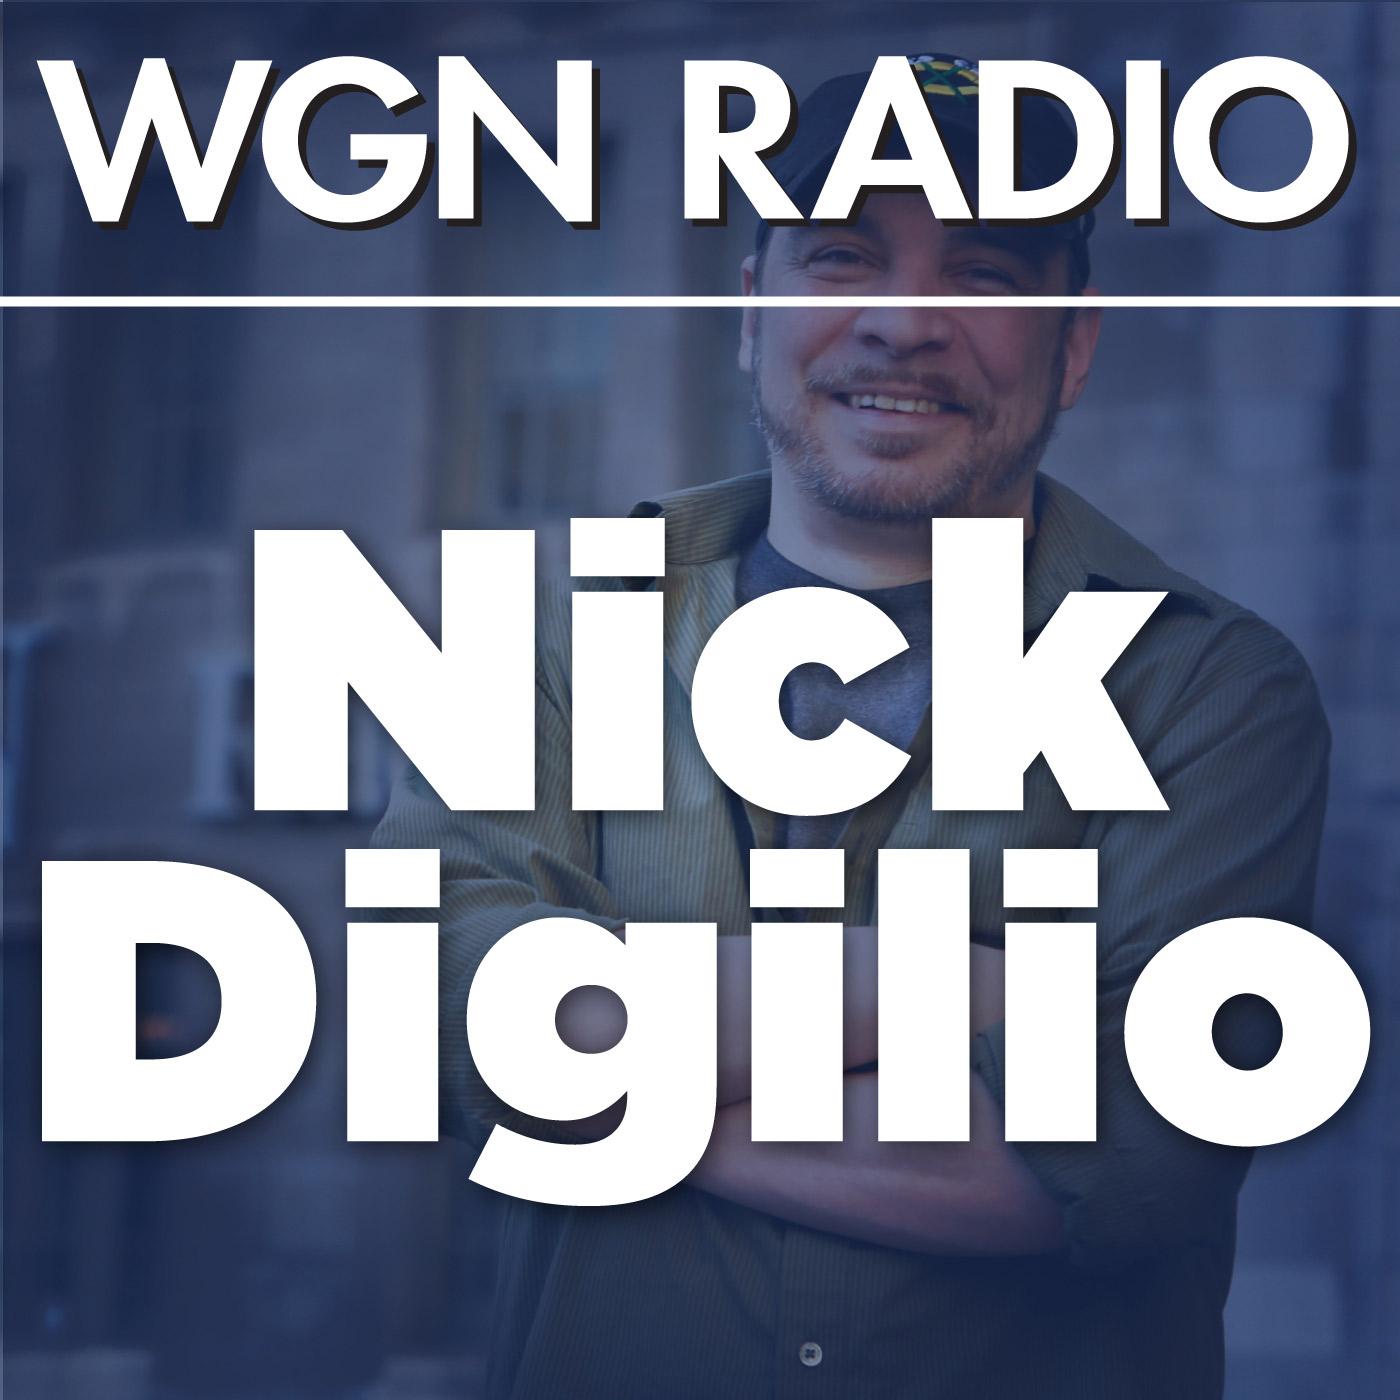 1400X1400_wgnradio_podcast_NickD_v3.jpg